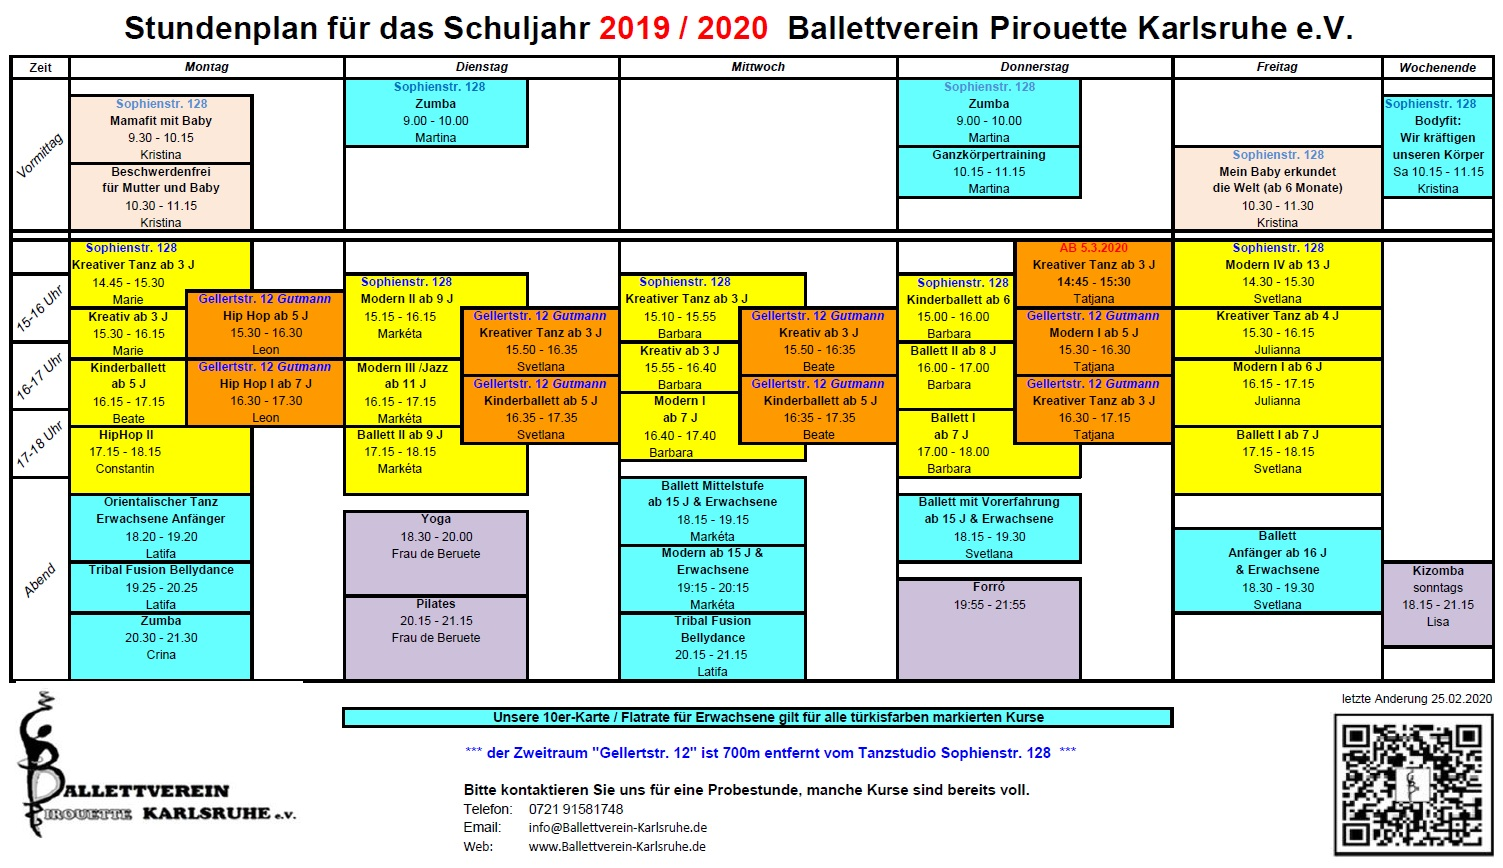 Stundenplan_Ballett_Ballettschule_Karlsruhe_Modern_Dance_Flamenco_Tanzschule_2019